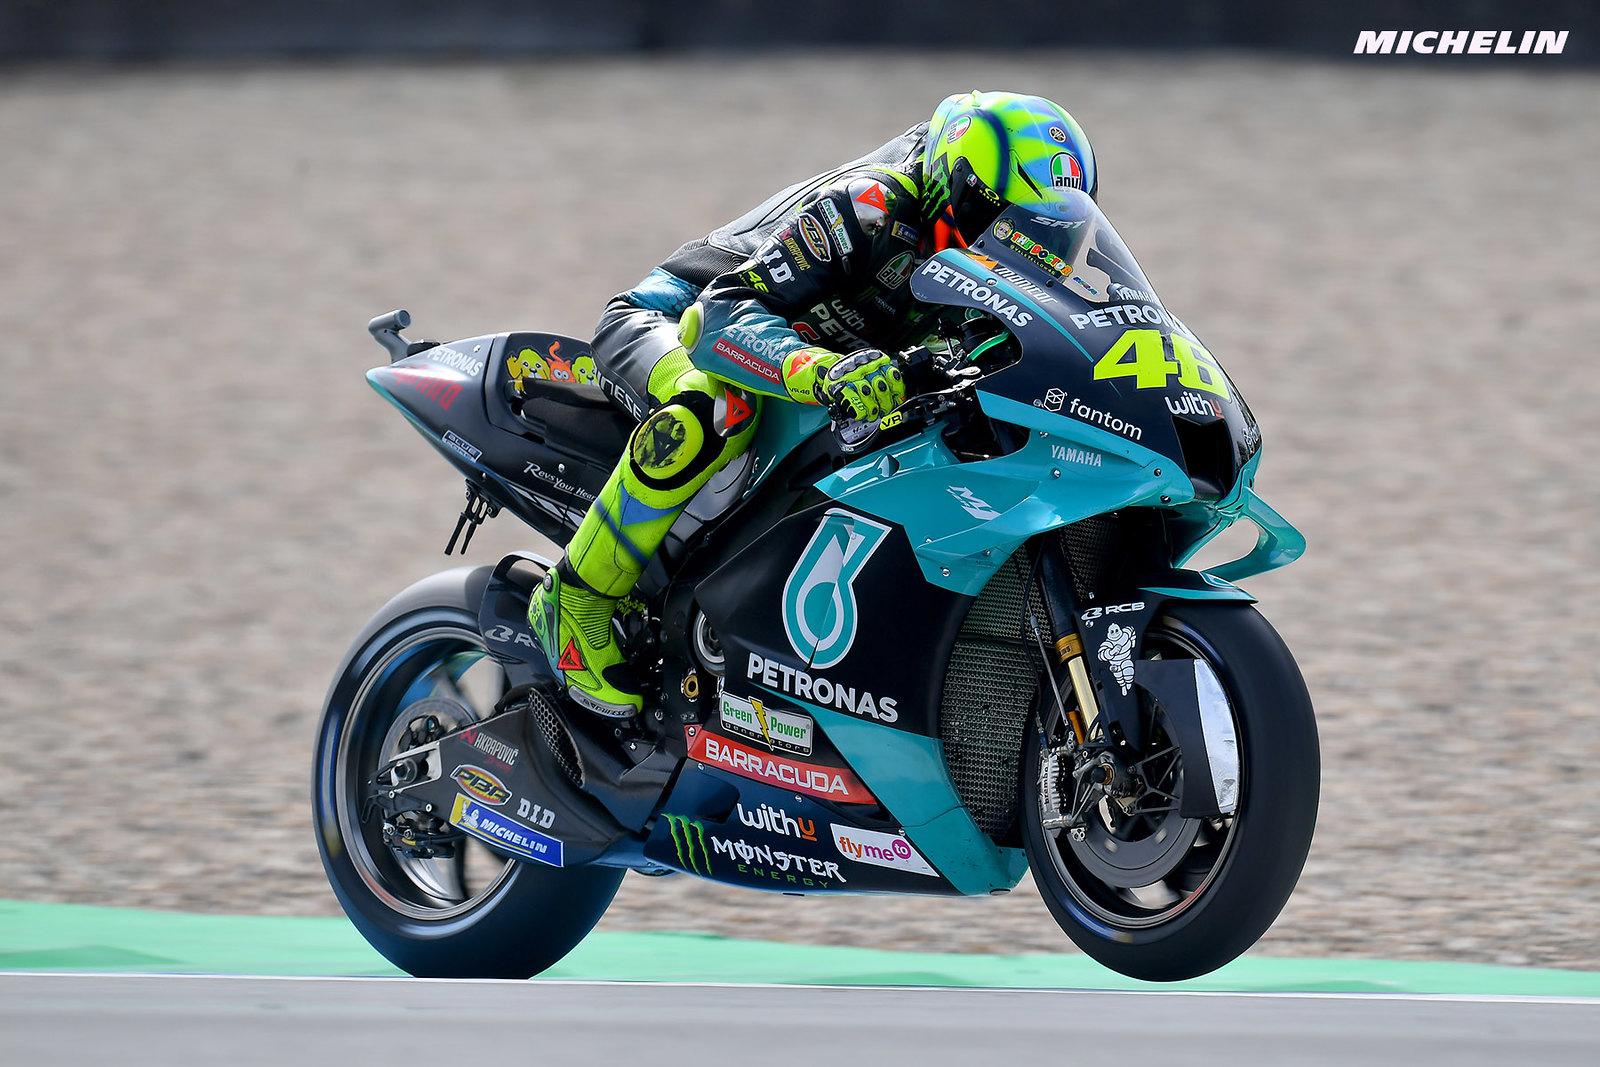 MotoGP2021 オランダGP 予選 バレンティーノ・ロッシ「明日も同じフィーリングが得られることを願いたい」